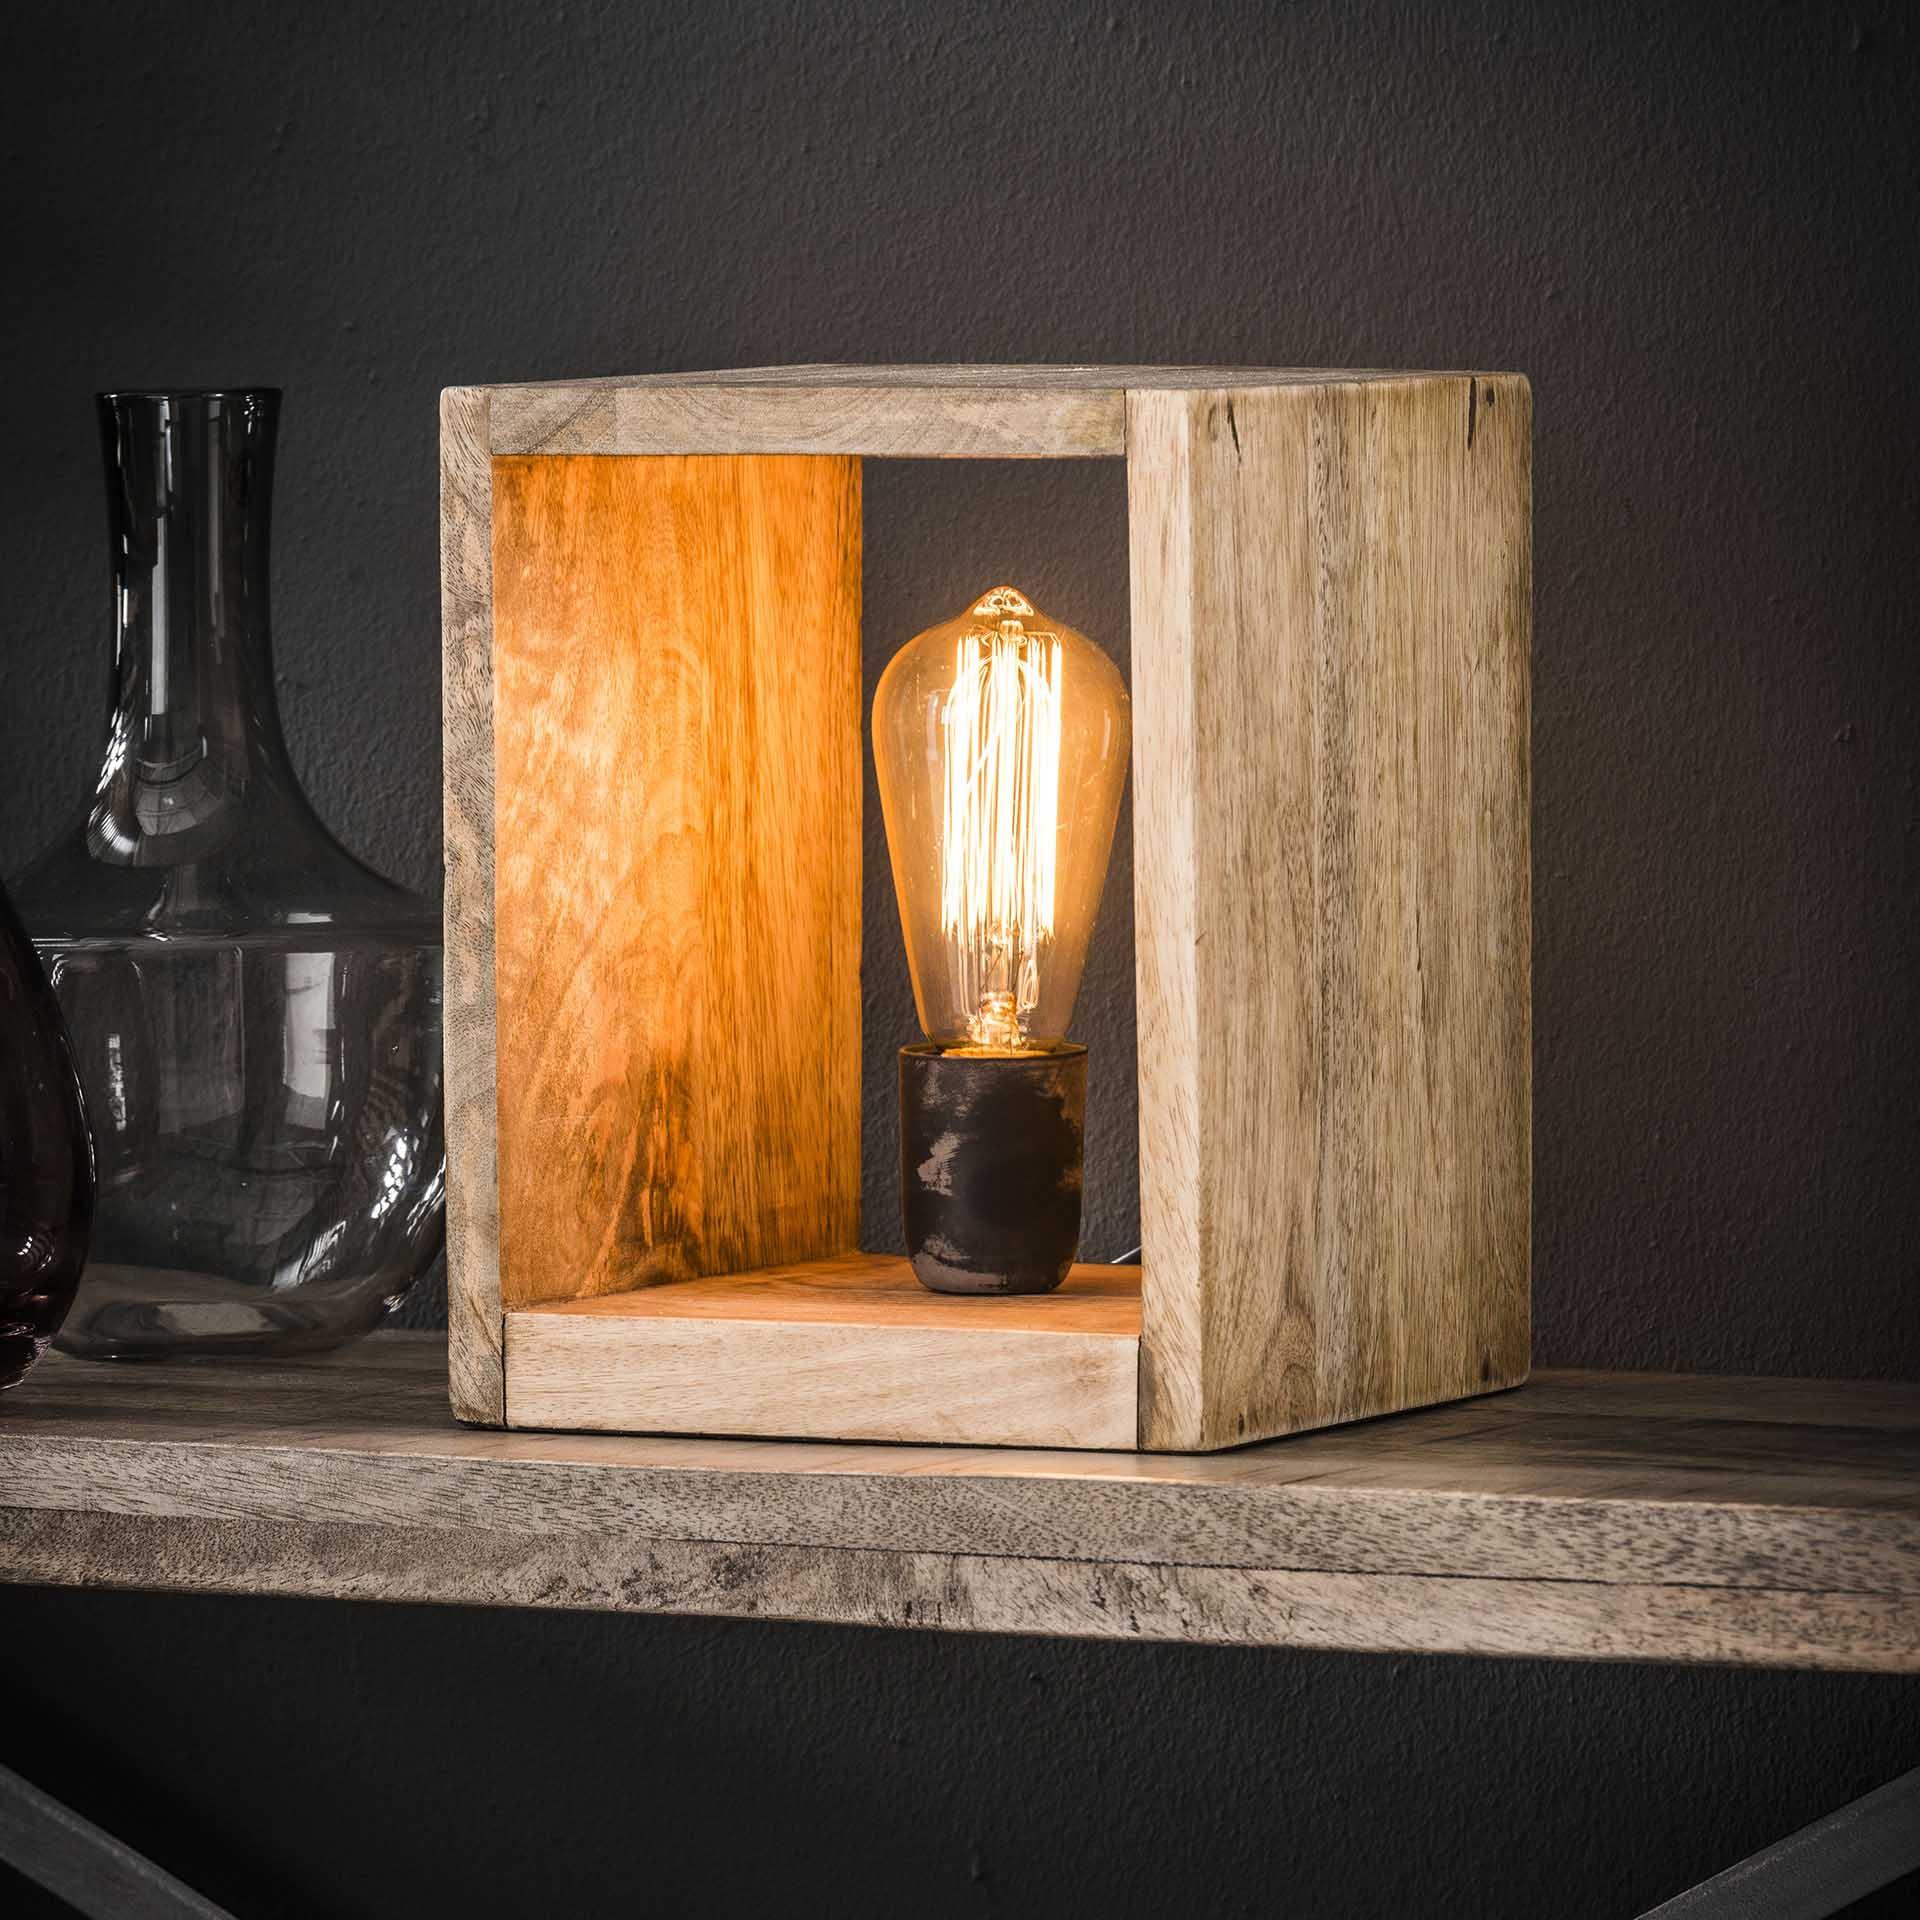 Tafellamp 'Nicole' vierkant mangohout Verlichting   Tafellampen kopen